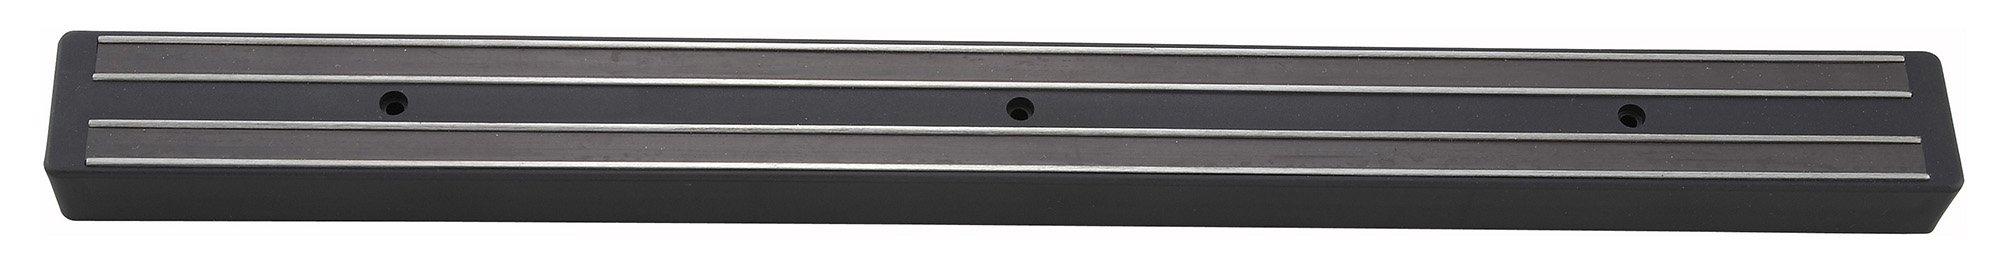 18 Magnetic Knife Holder, Plastic Base